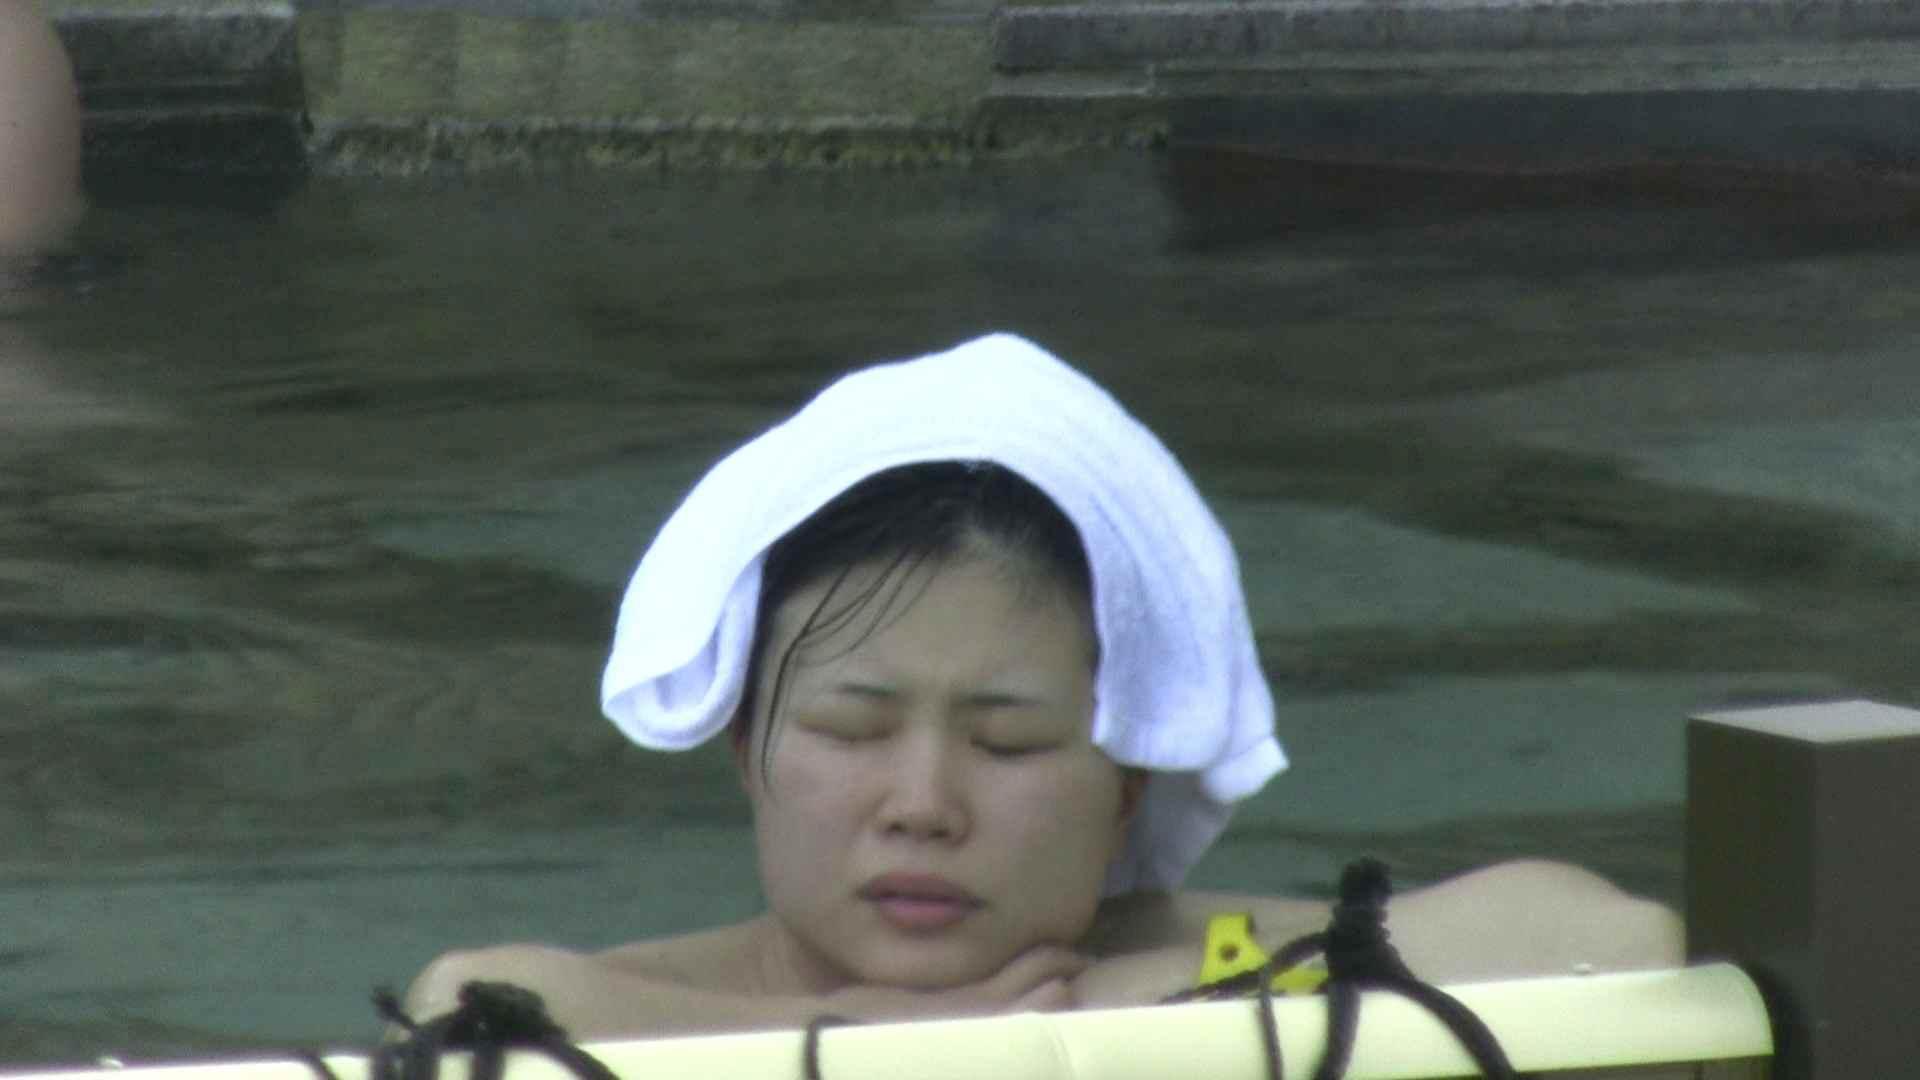 Aquaな露天風呂Vol.183 露天風呂編  104PIX 36